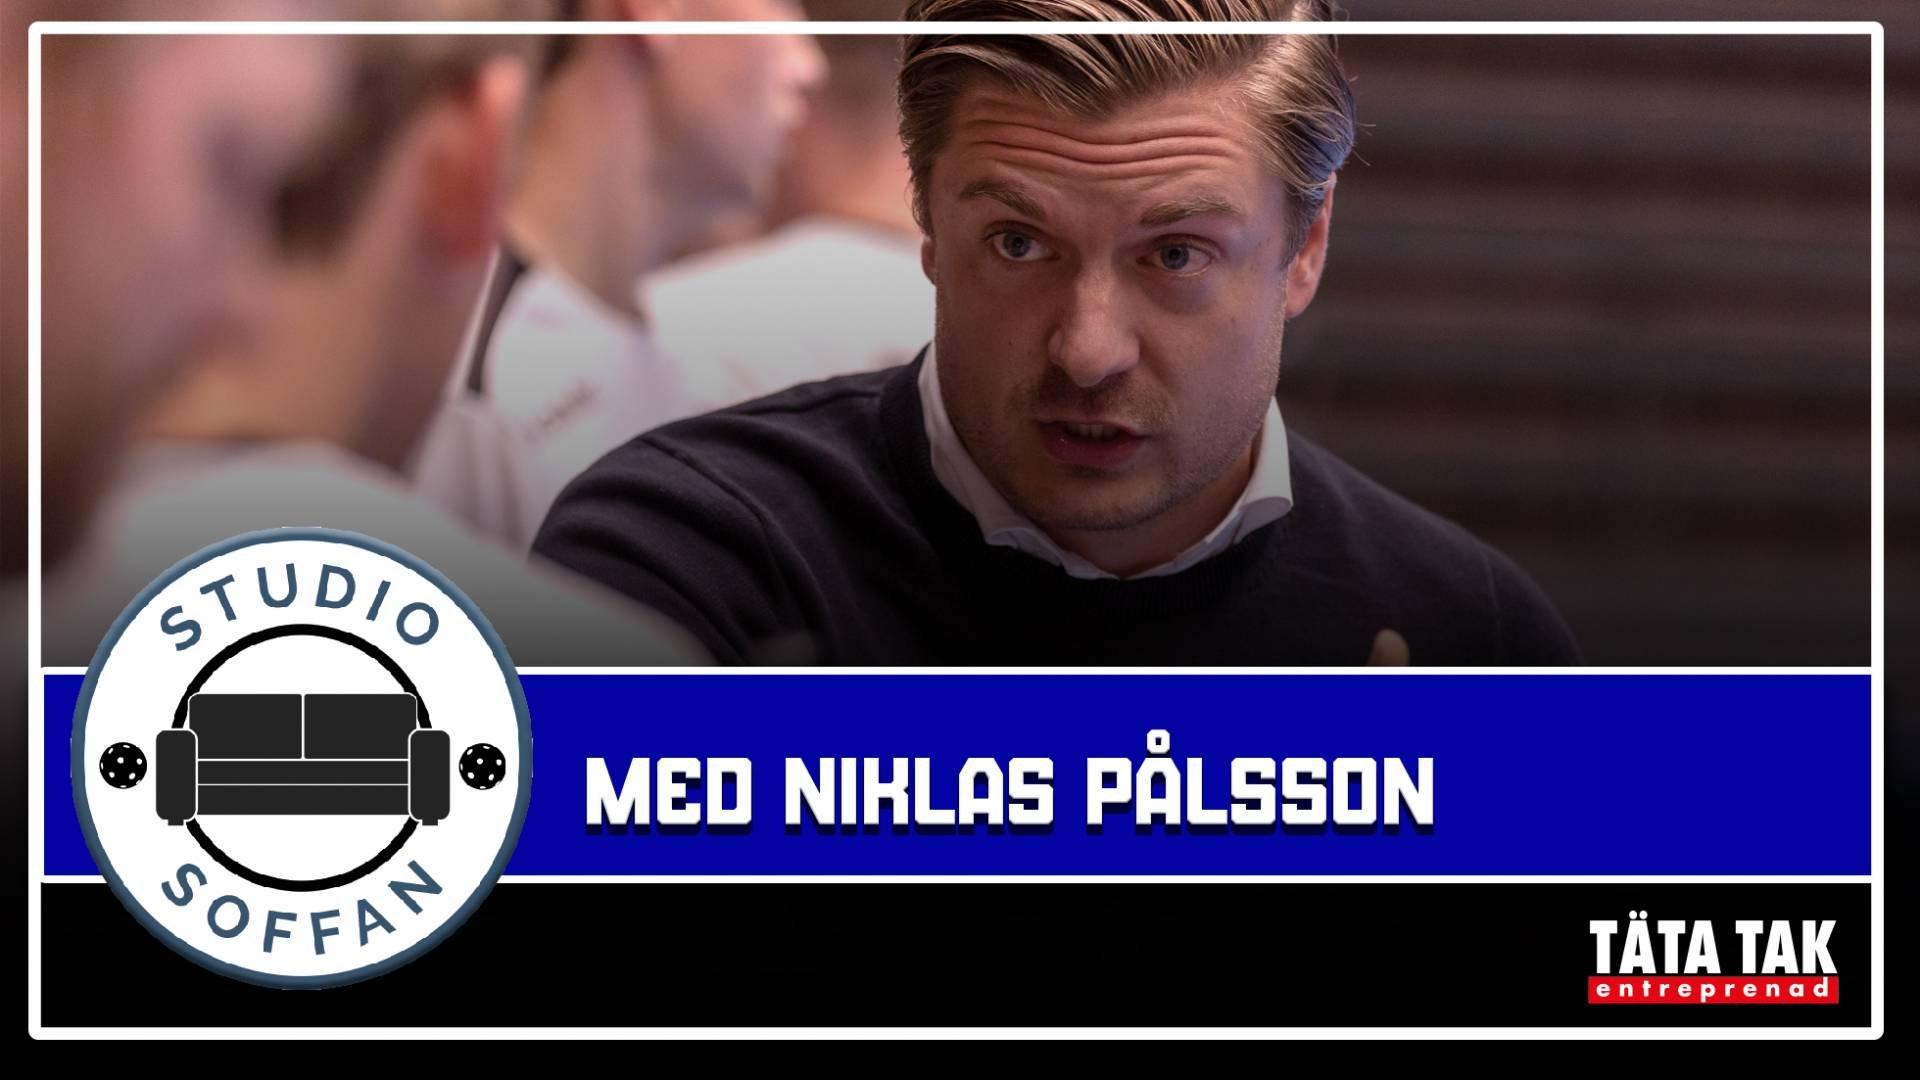 Studio Soffan - Niklas Pålsson